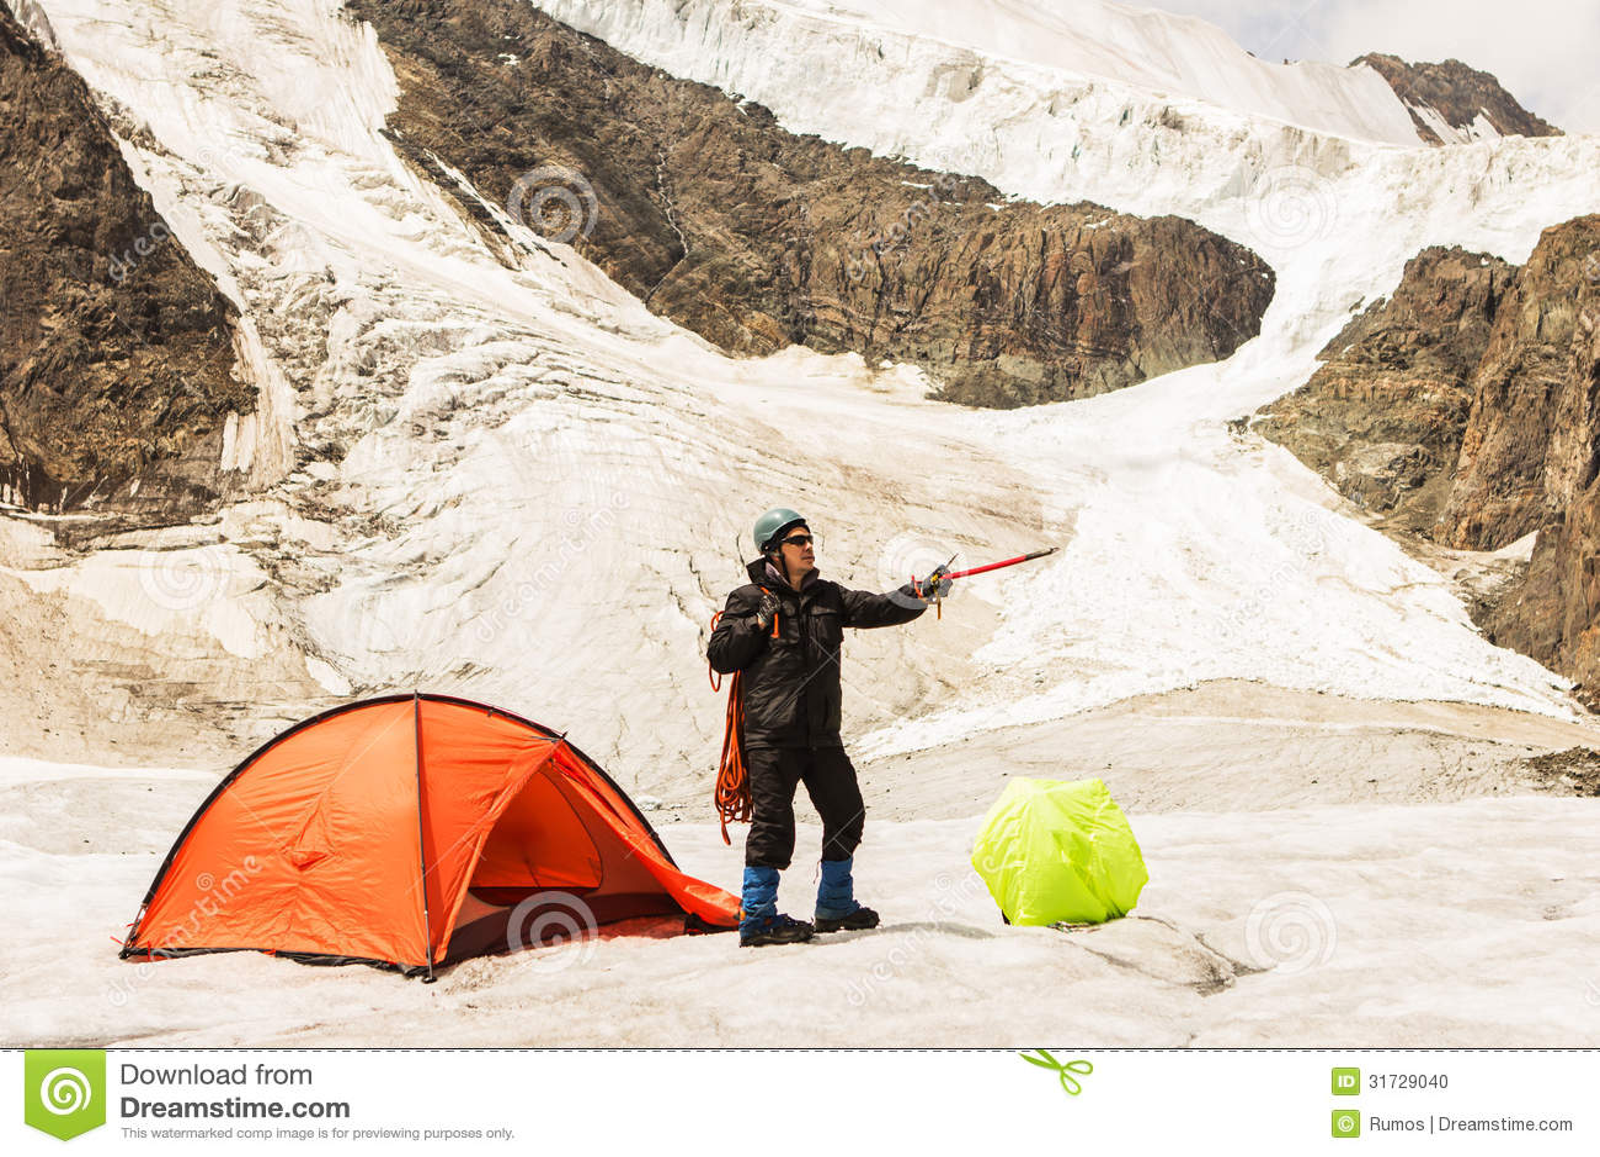 Arywista stoi blisko namiotu na lodowu